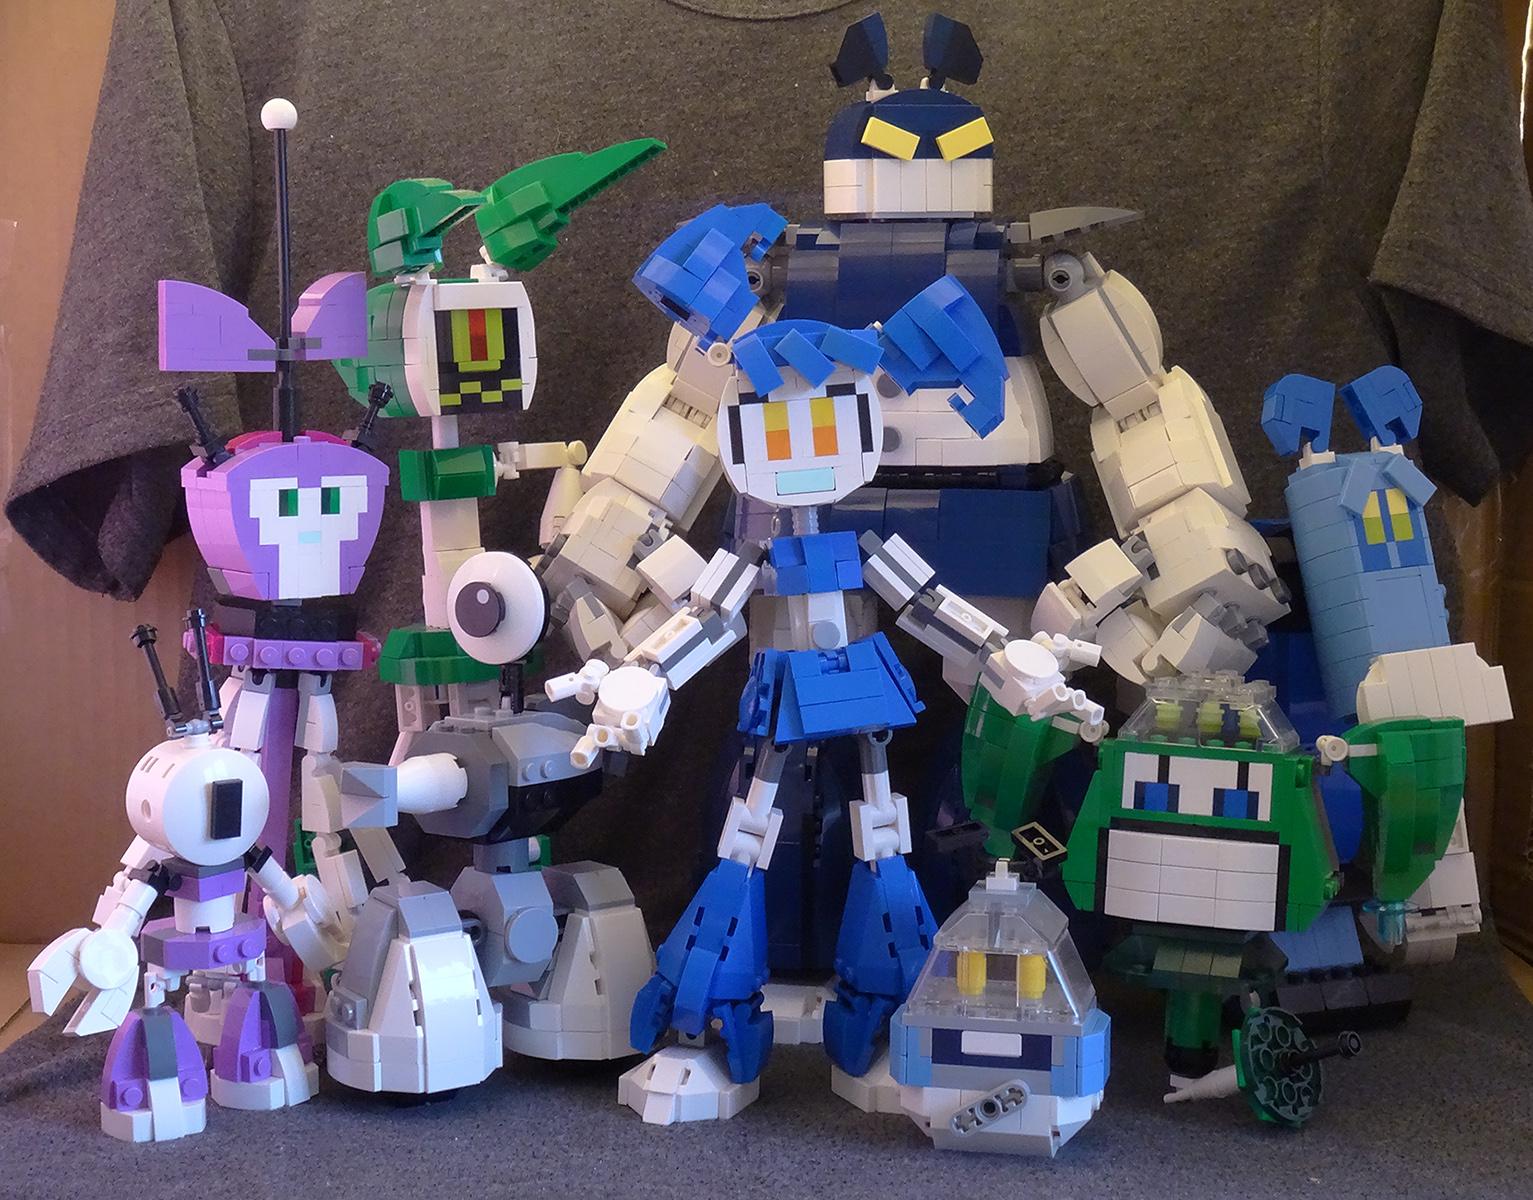 Fond D Ecran Fille Robot Lego Sœur Dessin Anime